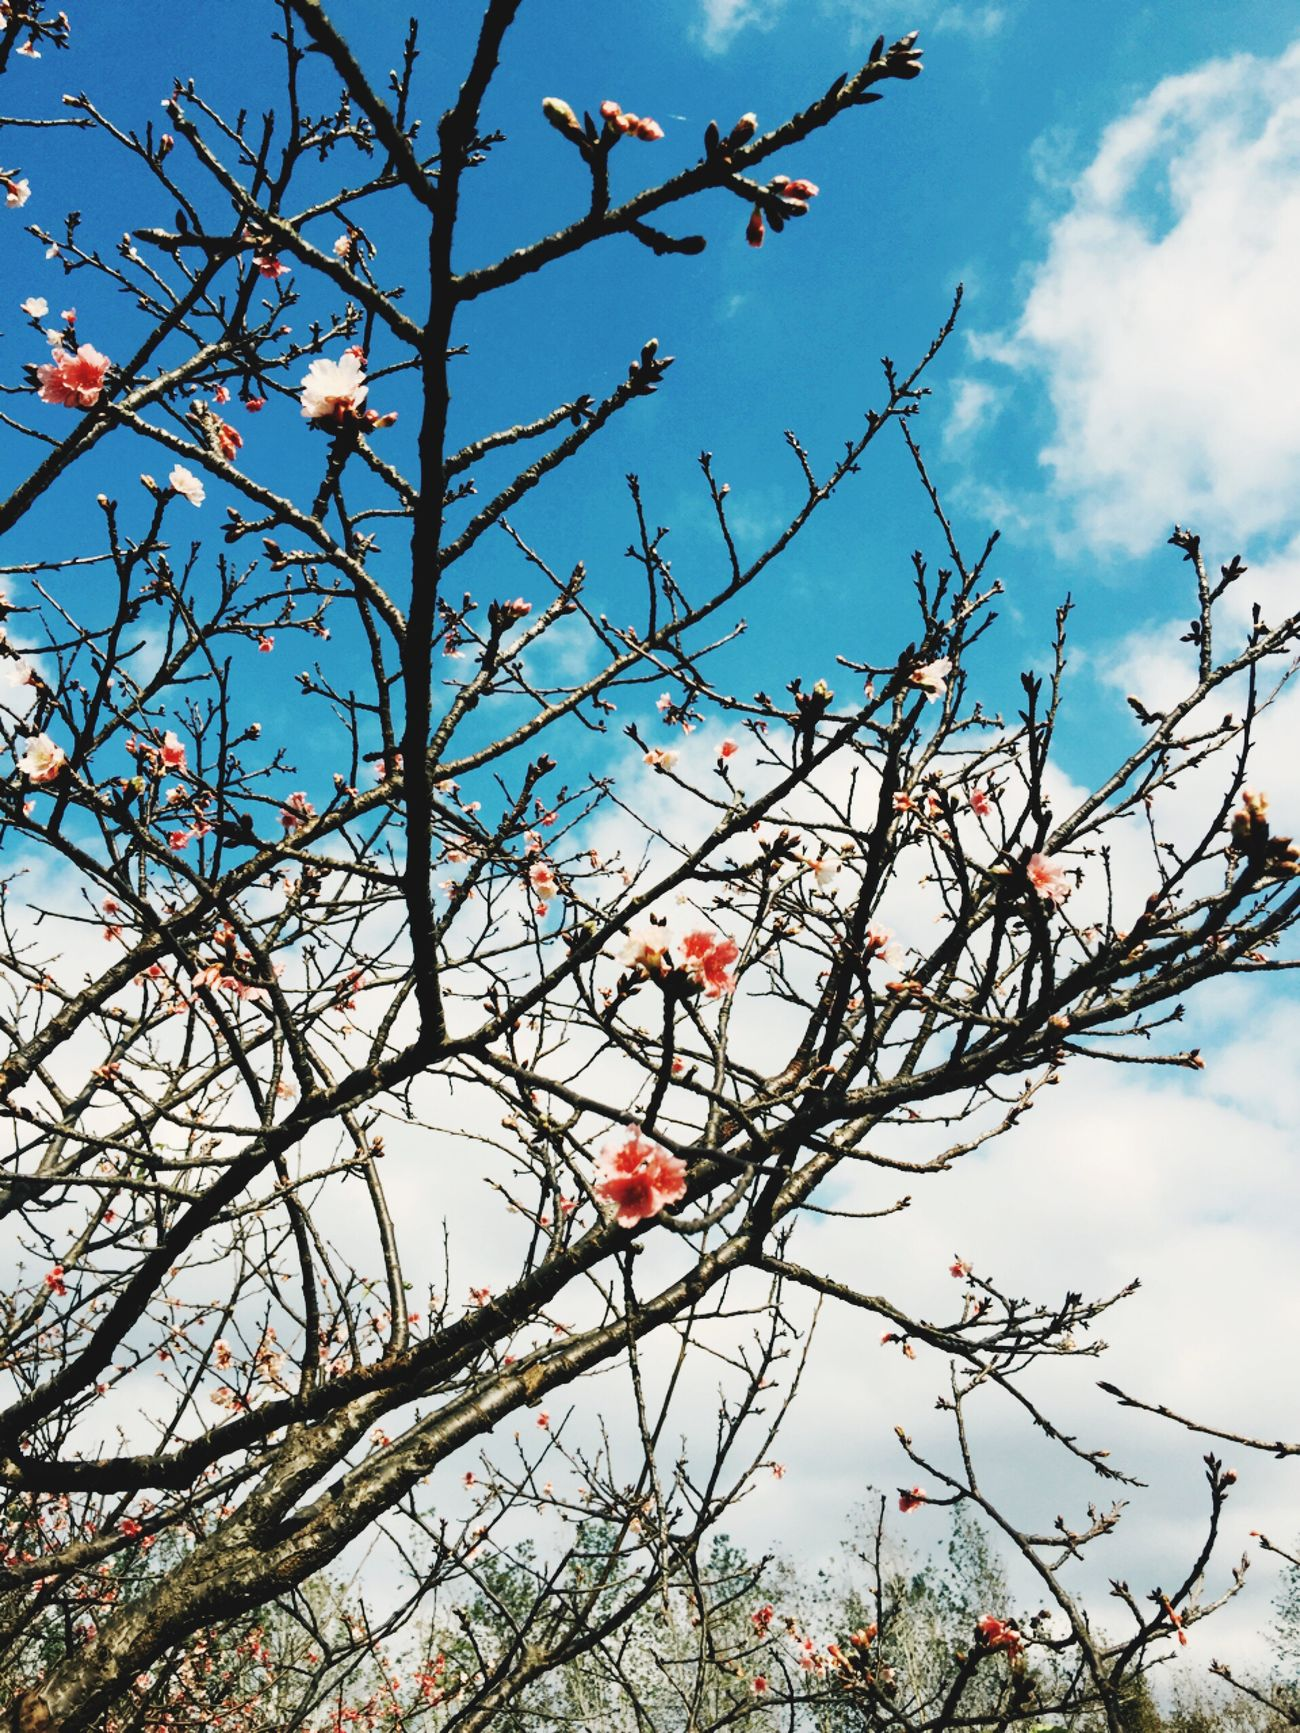 Beauty In Nature 櫻花開了Cherry blossomsきれいな桜が咲いた